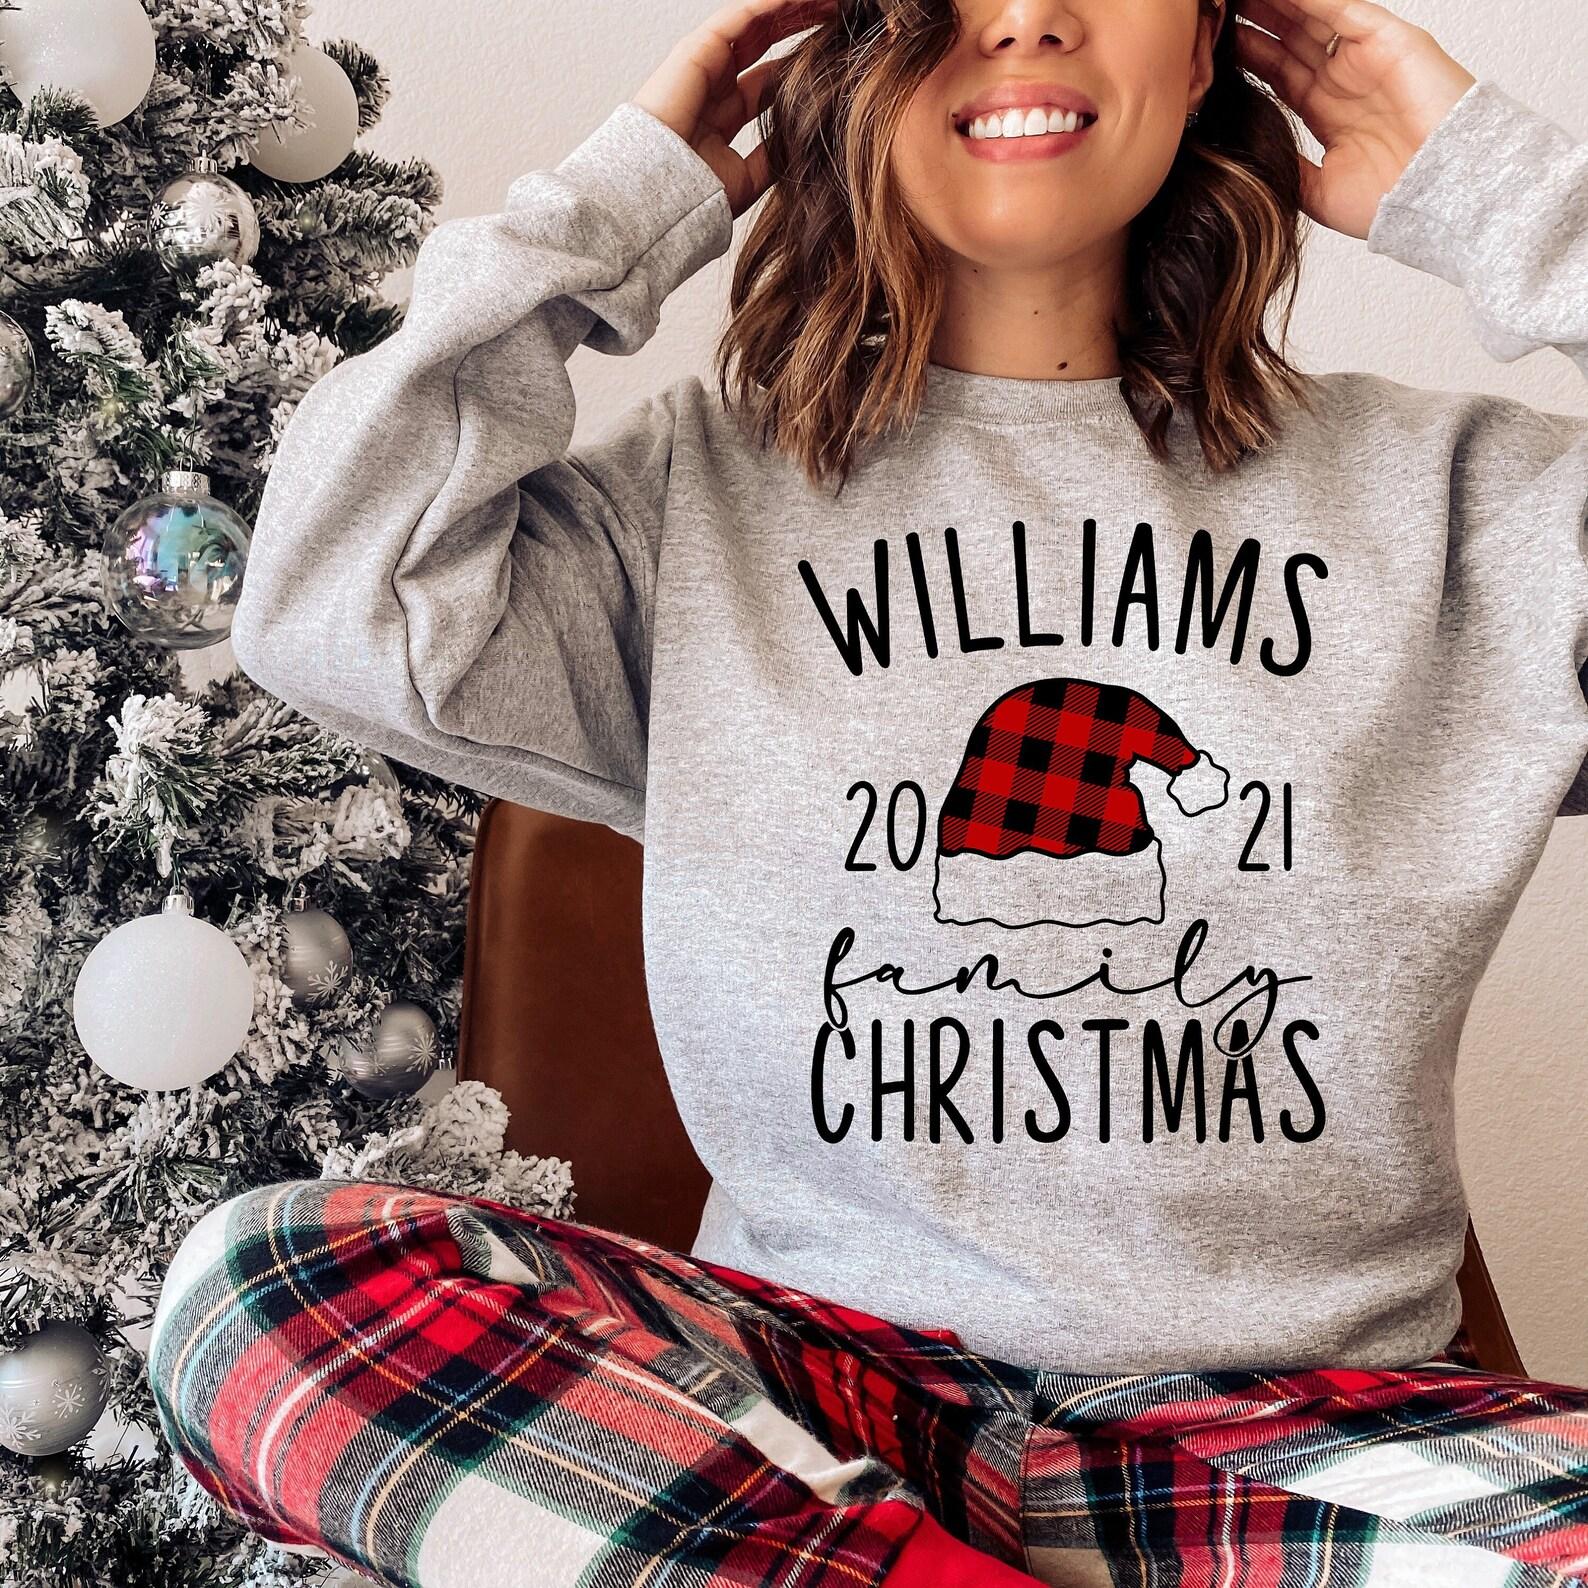 Buffalo Plaid Christmas Sweatshirt   Santa Hat   Custom Family Name  Sweatshirts For The Family   Christmas Eve Pajamas PJs   Unisex Crewneck Sweatshirt